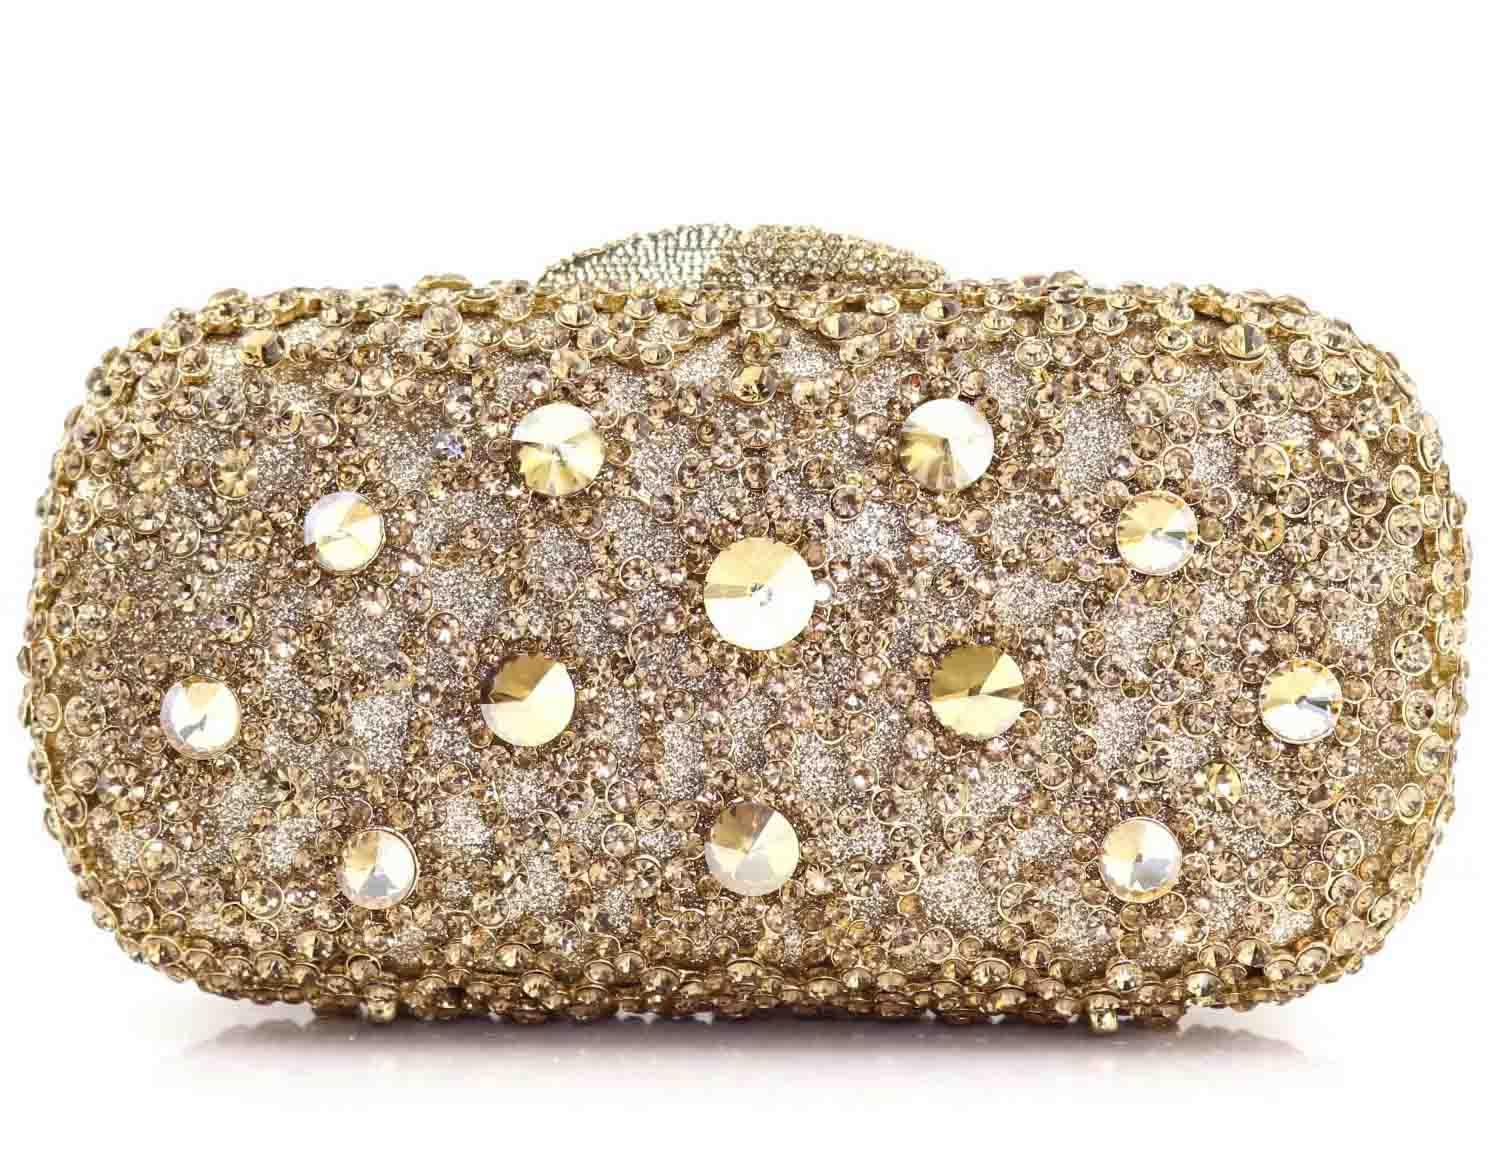 04b79e665ccf1 Kristal altın el çantası tasarım kadın parti Taklidi Nedime debriyaj çanta  debriyaj akşam çantalar düğün kılıf